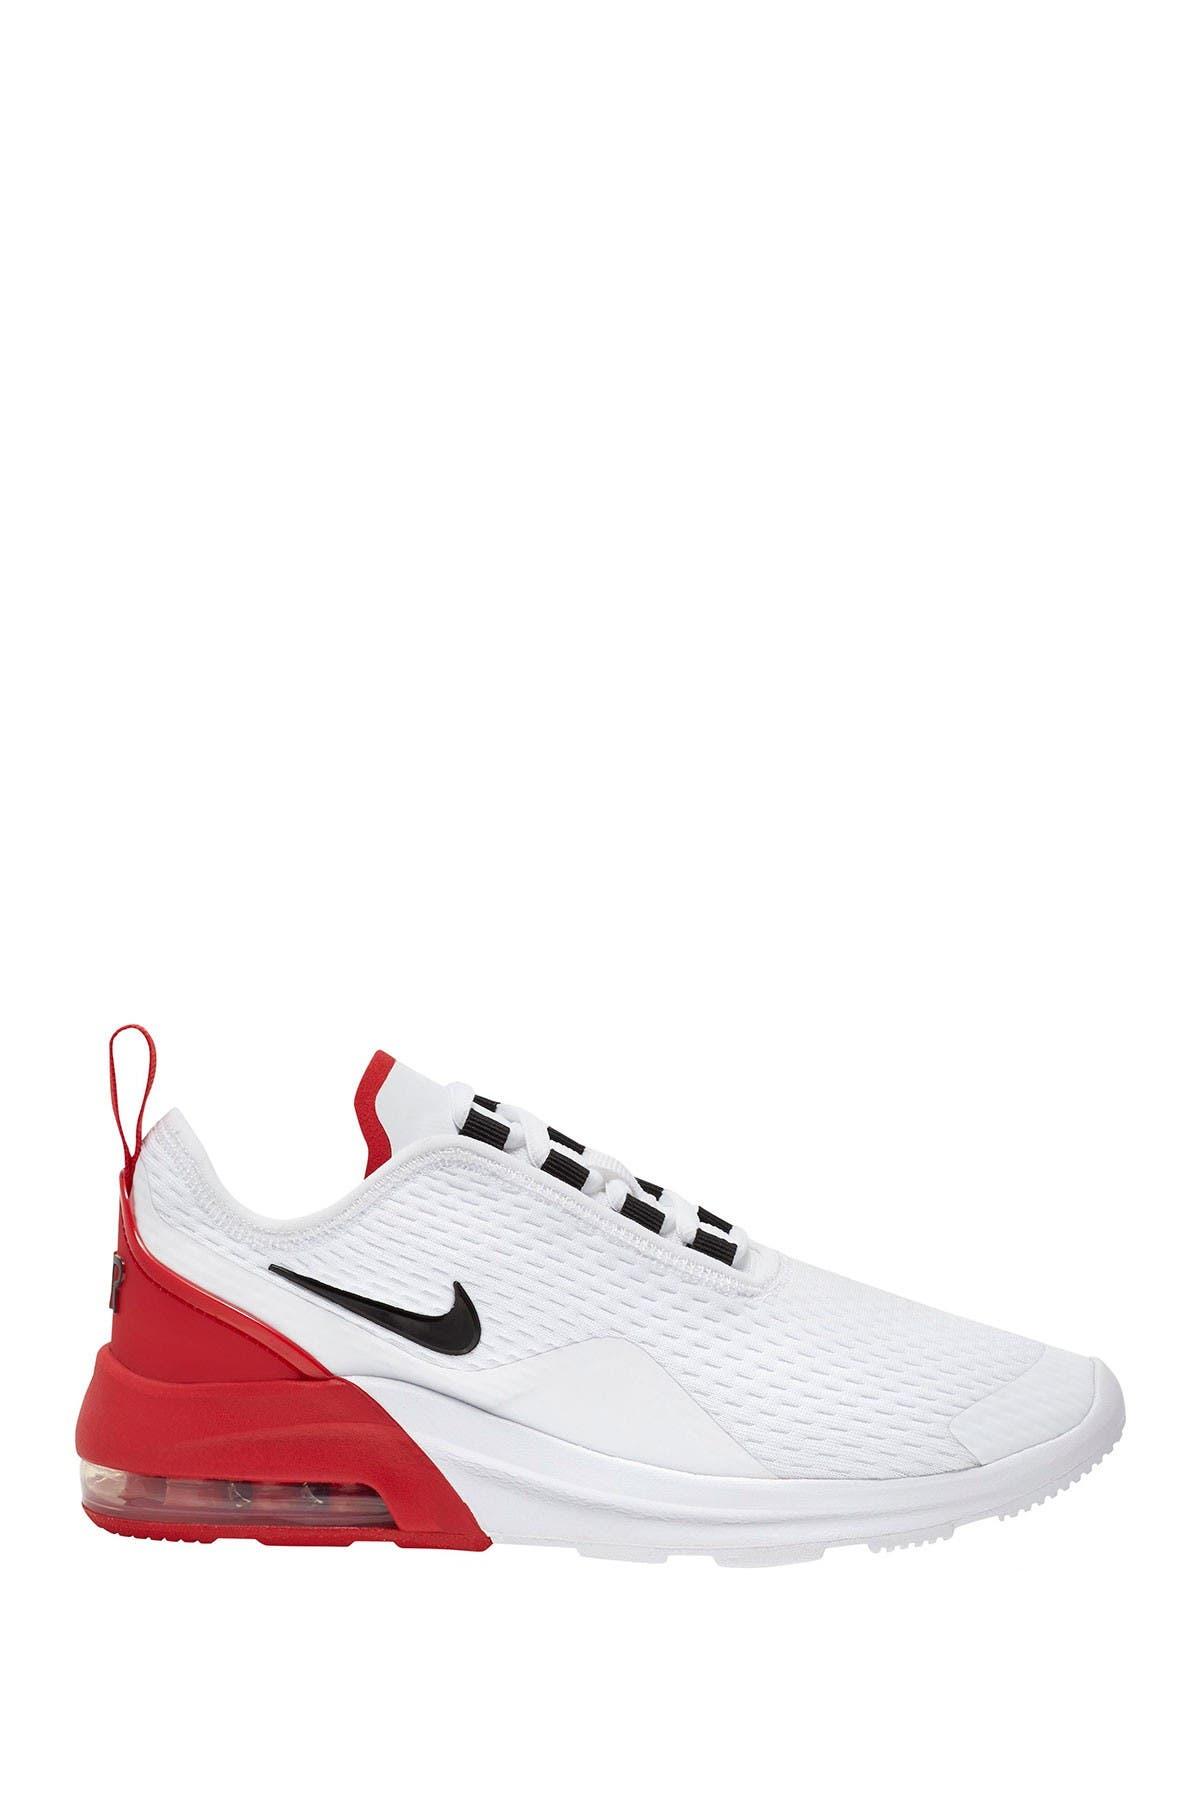 Nike Air Max Motion 2 GS Junior Girls Running Fashion Trainers Grey White Pink